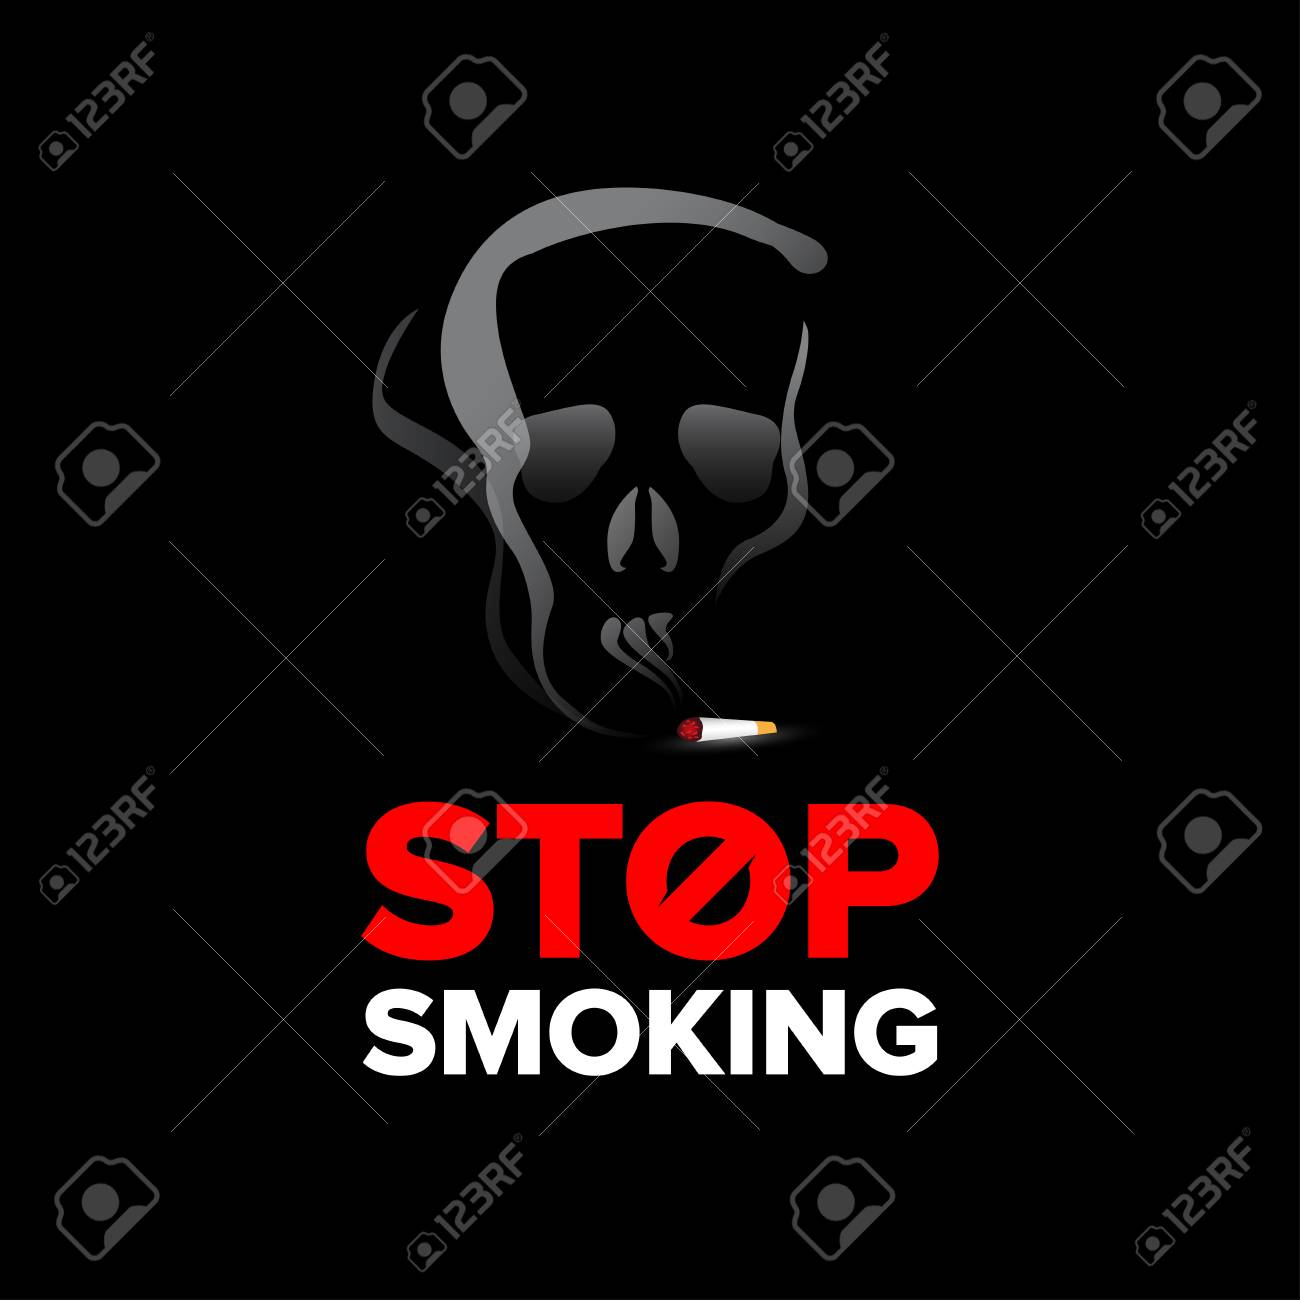 stop smoking poster billboard design stop smoking sign isolated